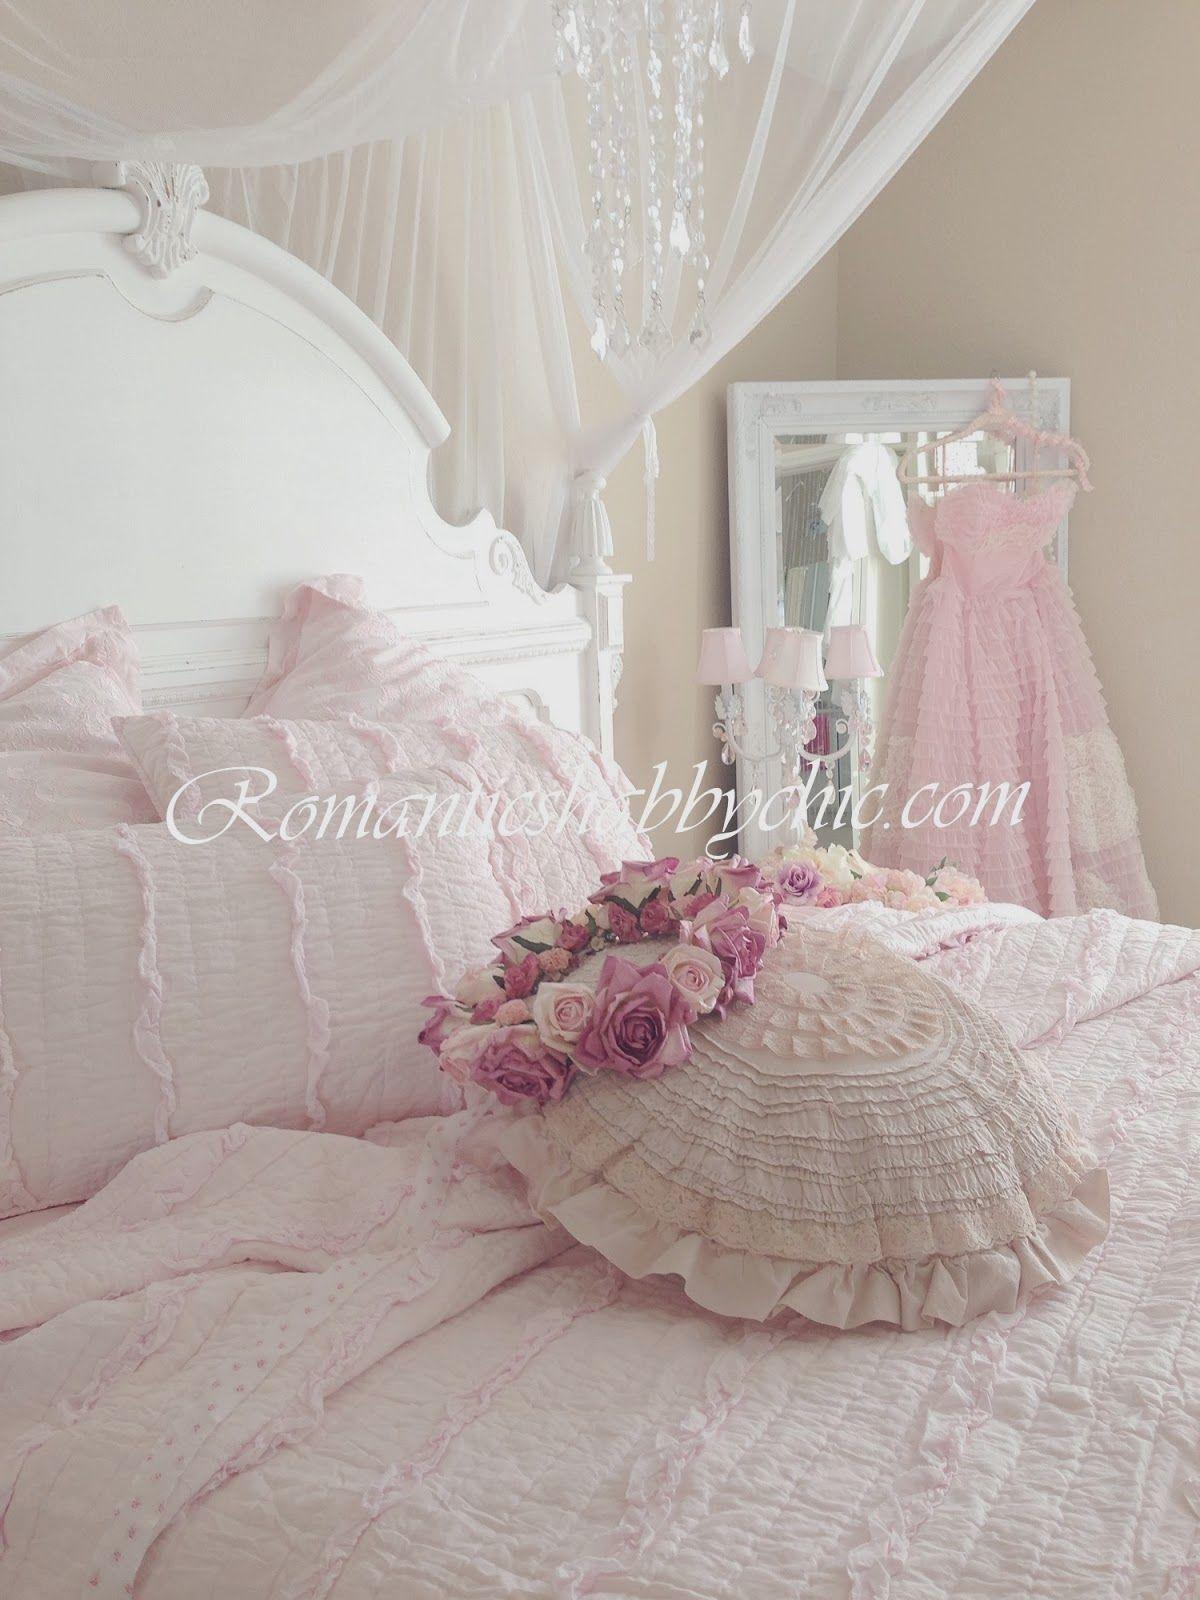 Romantic shabby chic home romantic shabby chic blog - My Shabby Chic Home Romantik Evim Romantik Ev Romantic Shabby Chic